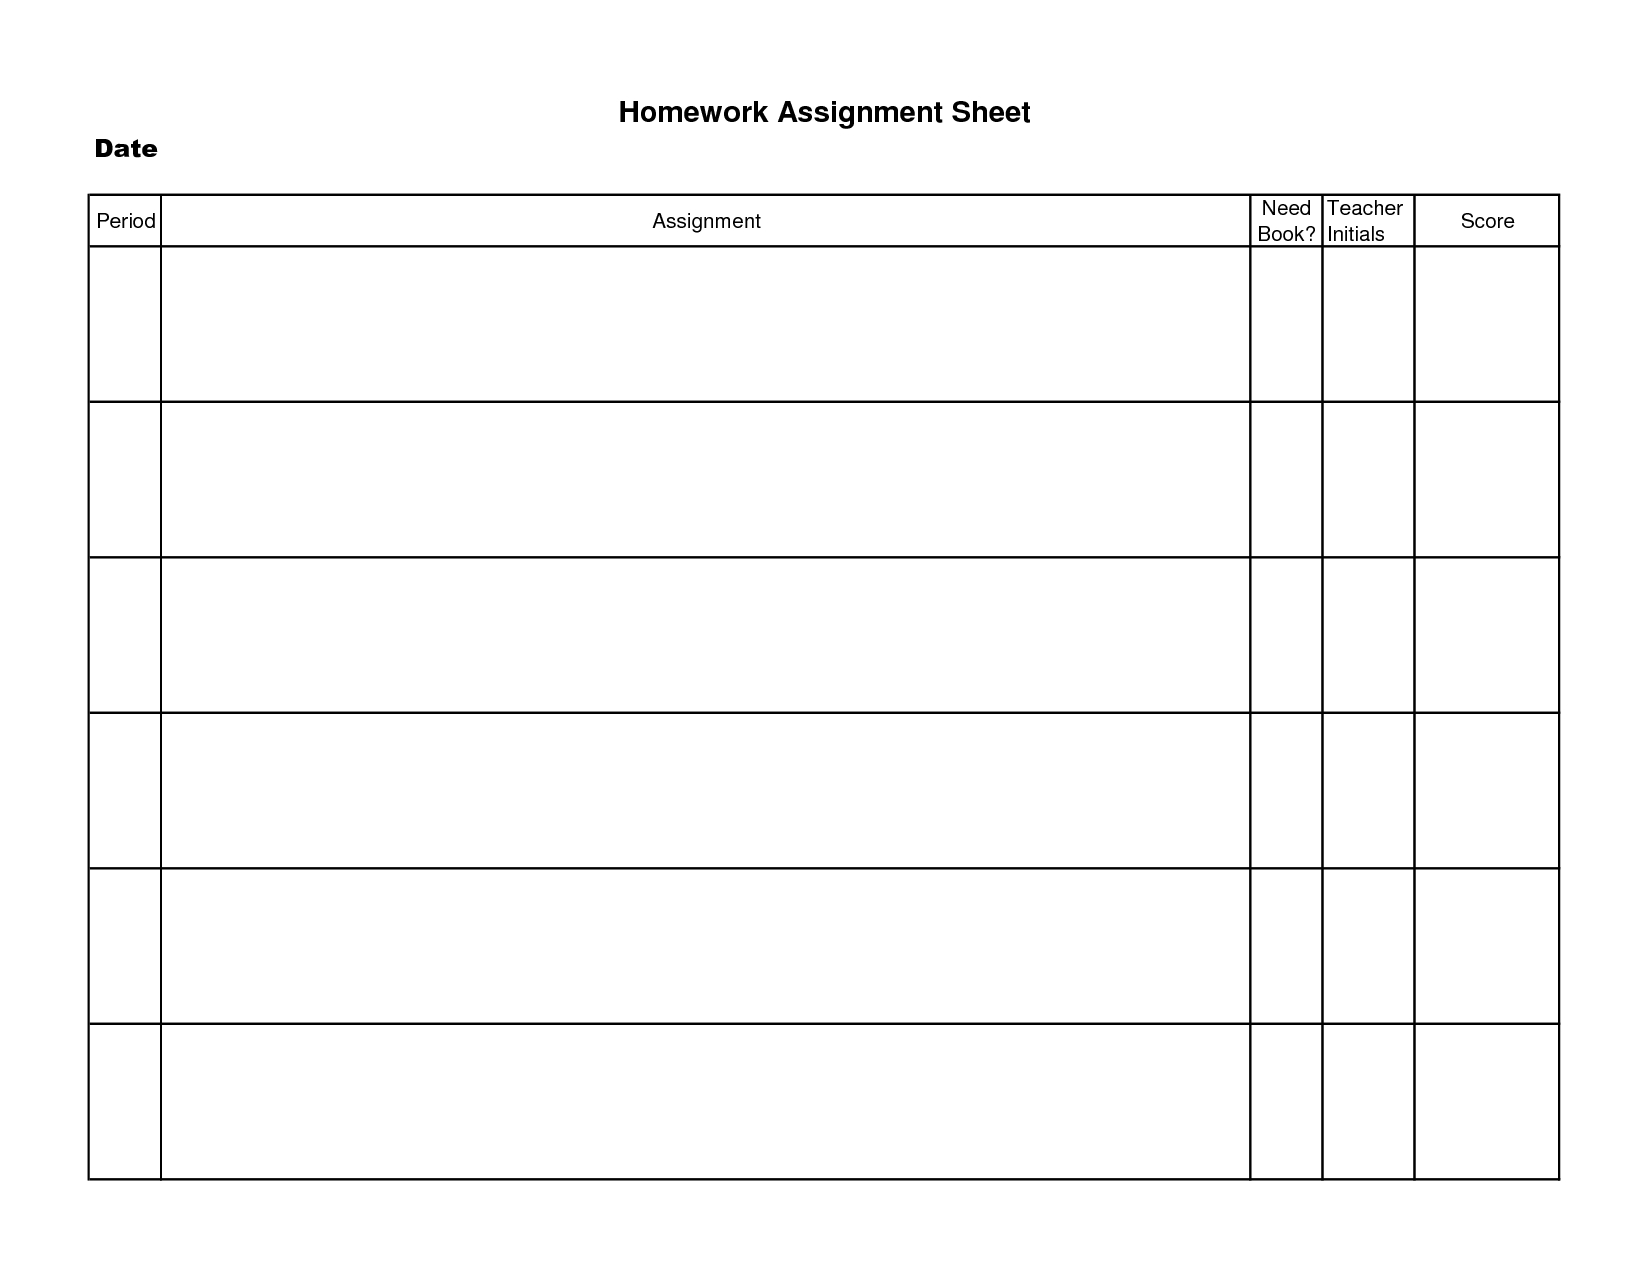 Printable Homework Assignment Sheet Template | Decrease Depression - Free Printable Homework Assignment Sheets